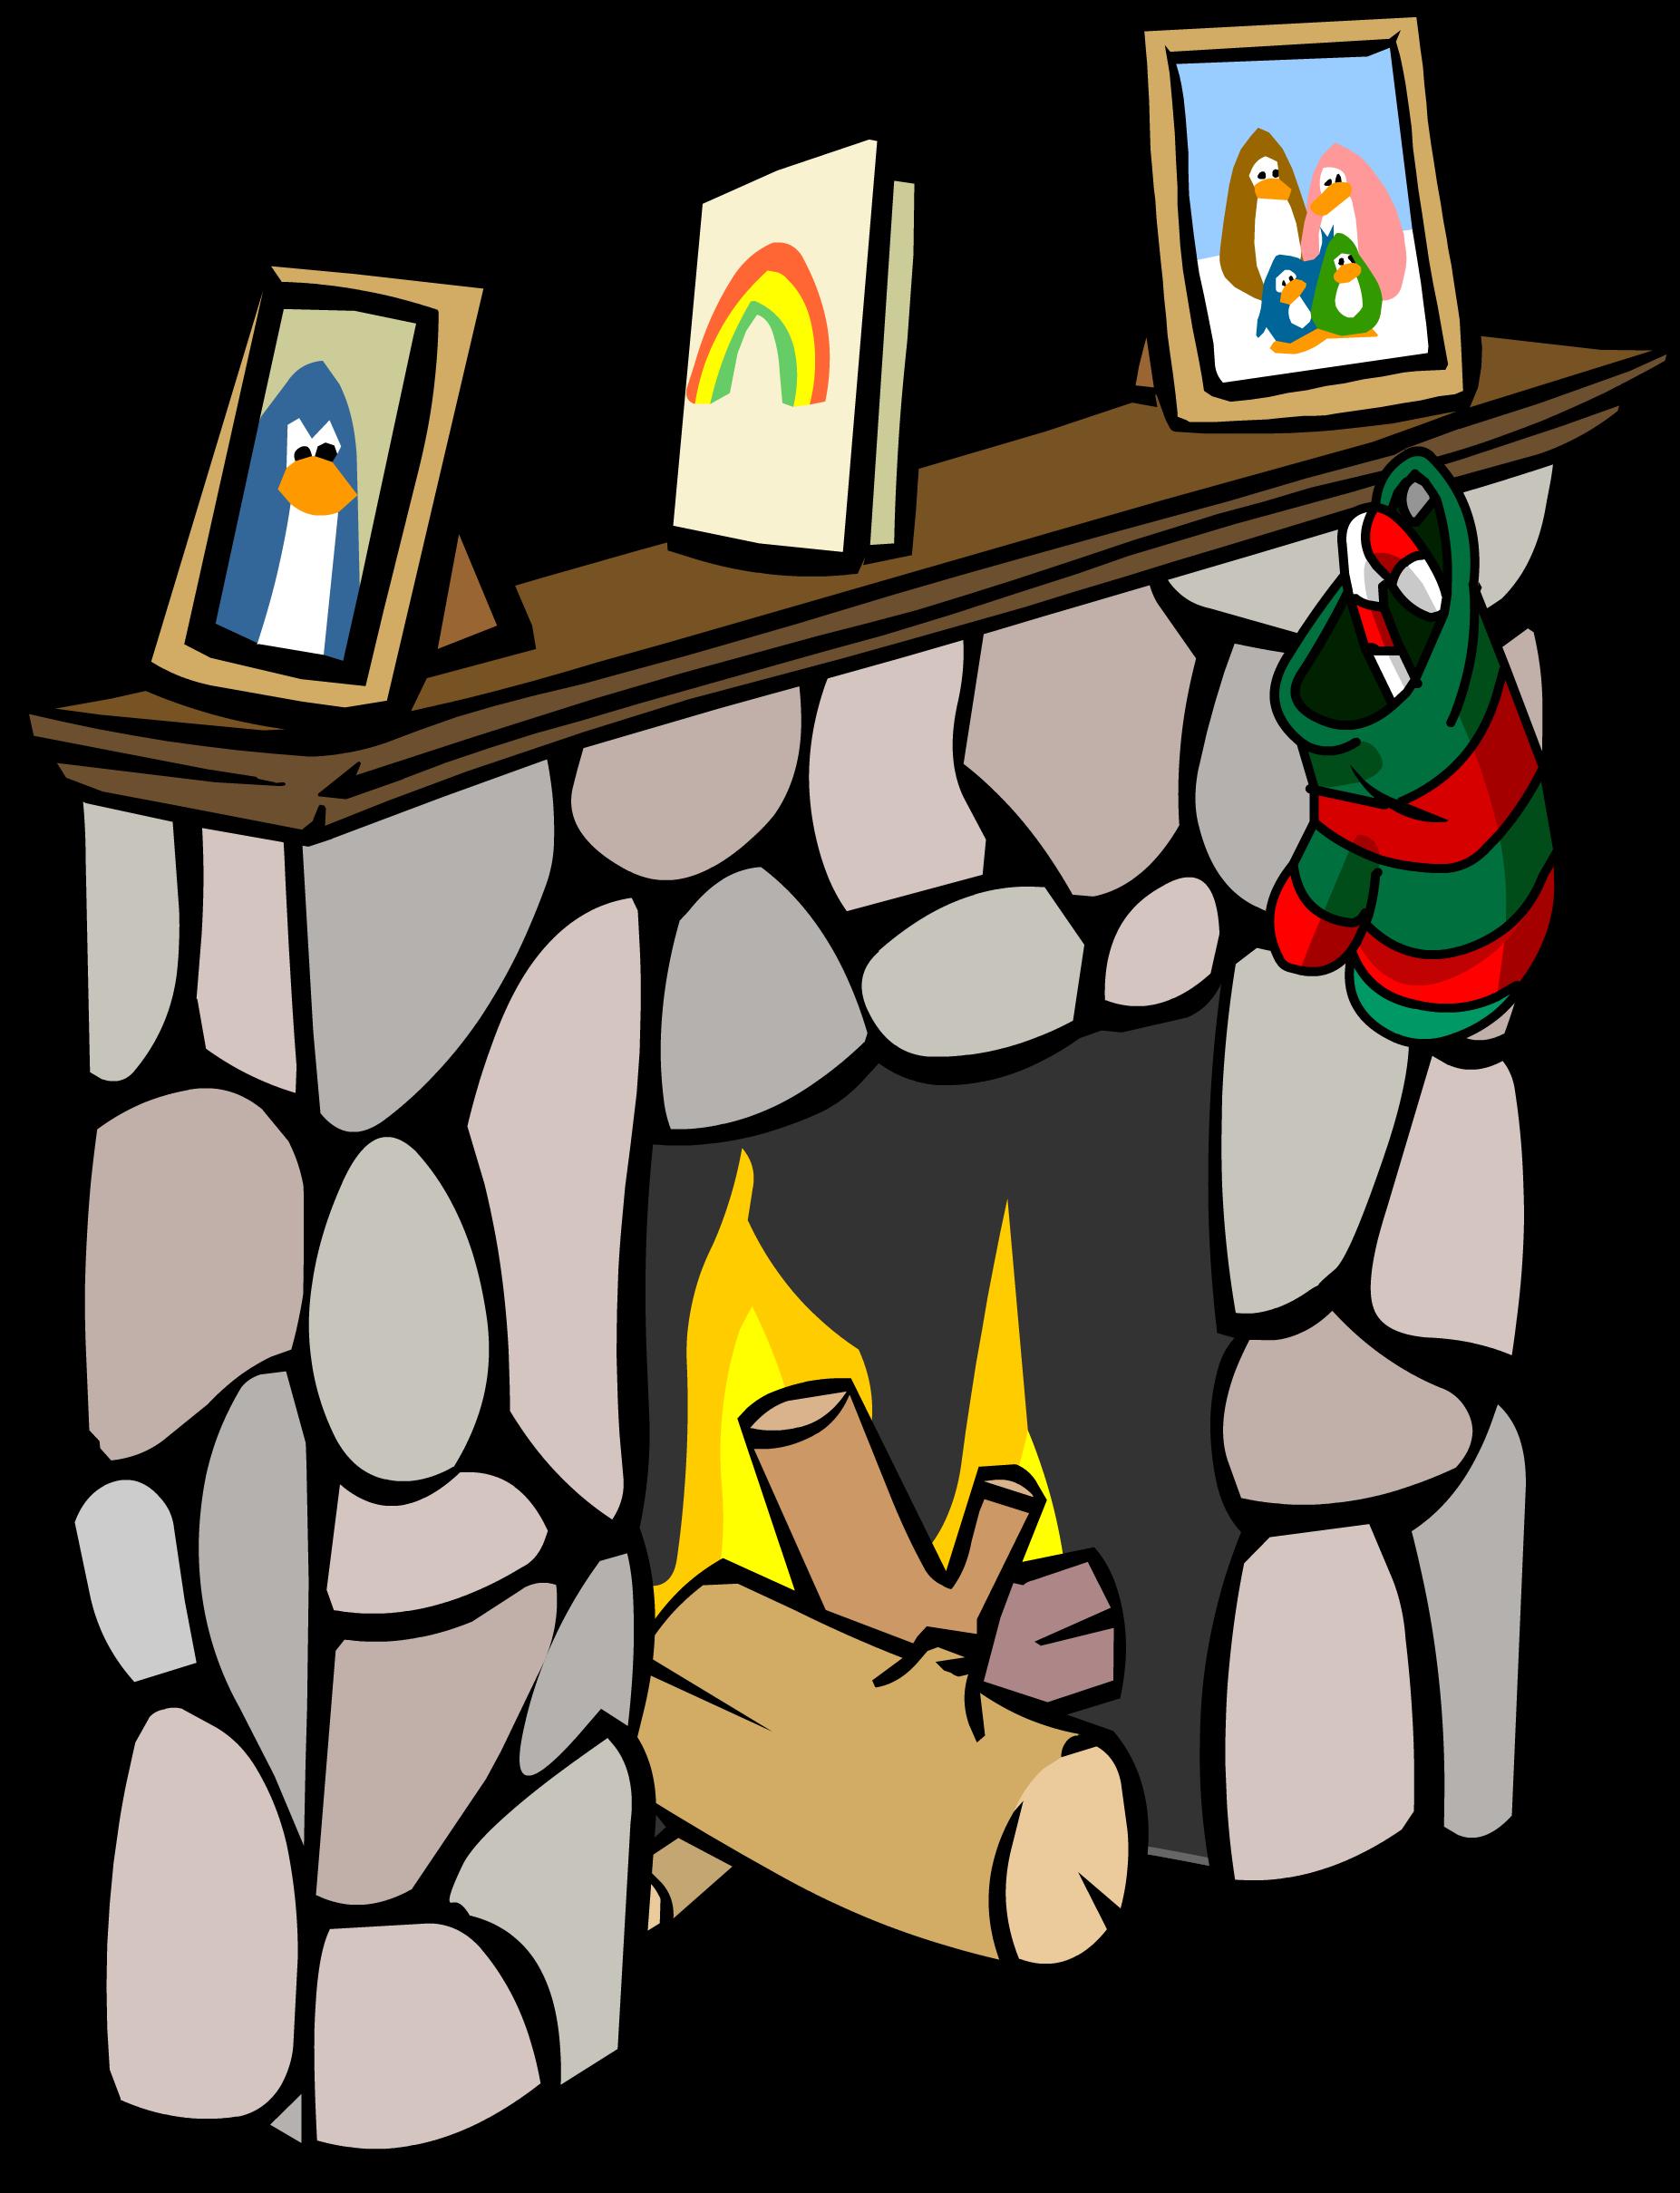 Image fireplace sprite png. Pilot clipart table captain